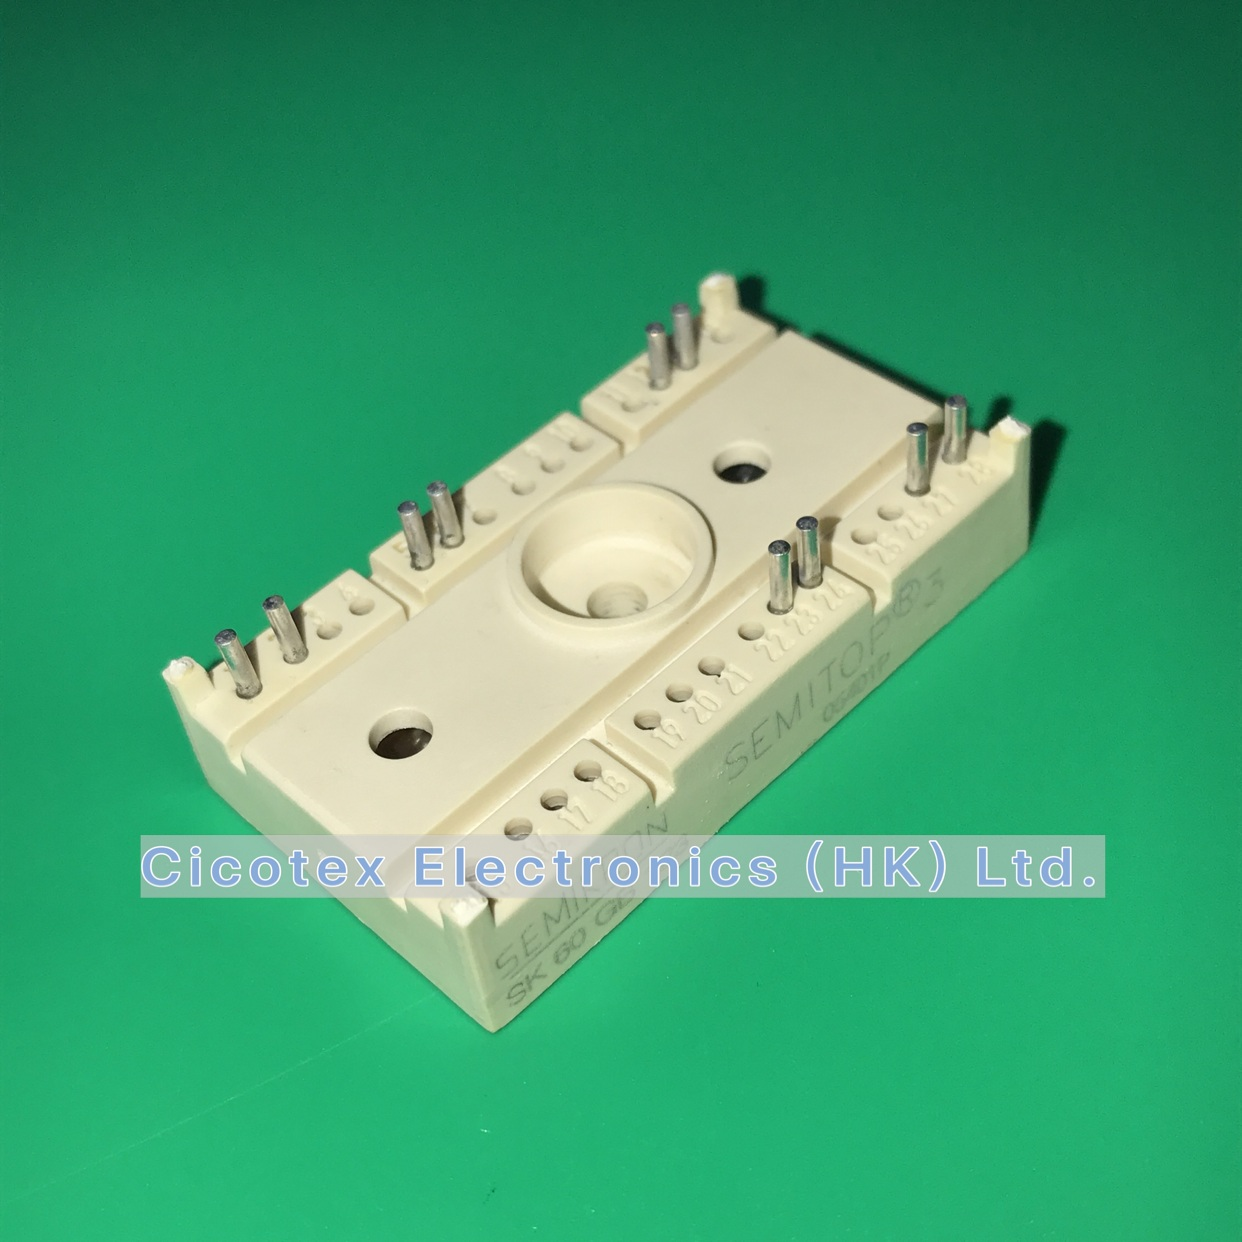 SK60GB123 MODULES SK 60 GB 123 IGBT MODULE SK60-GB123